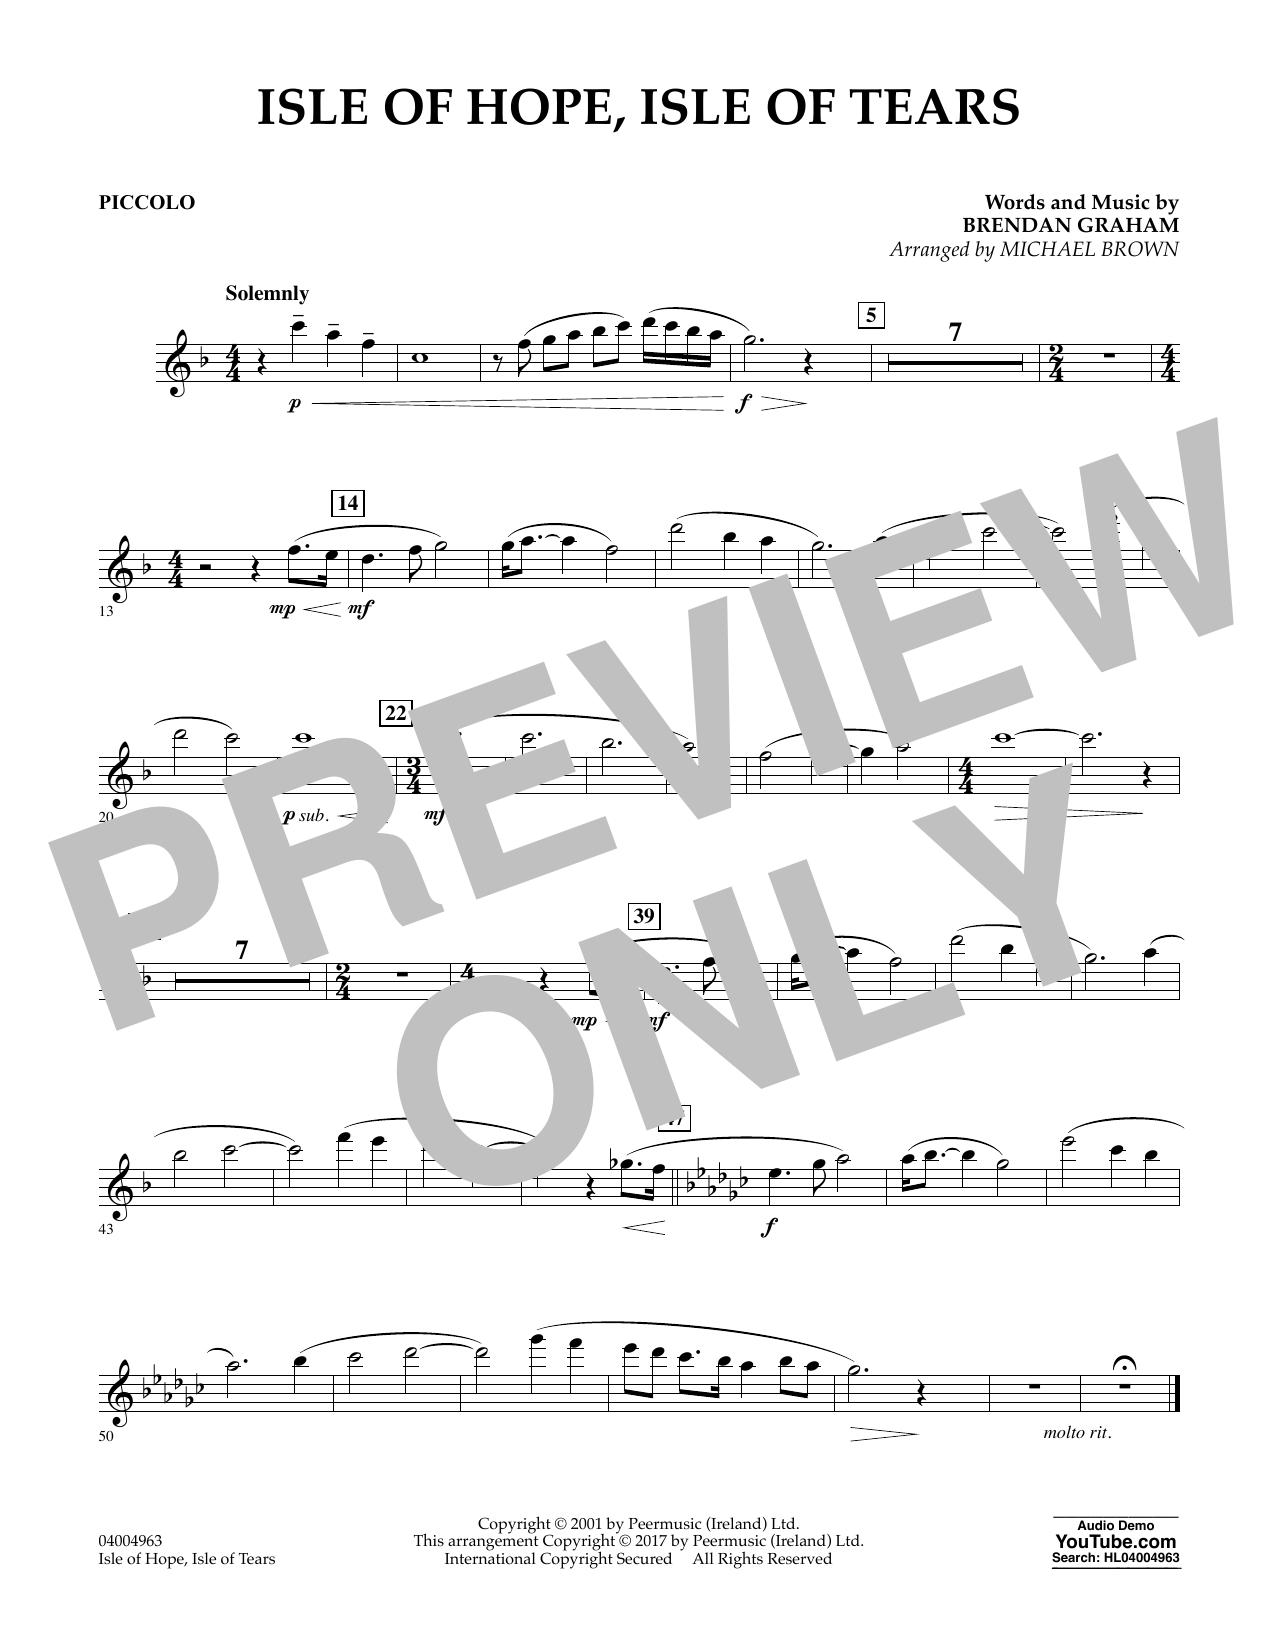 Isle of Hope, Isle of Tears - Piccolo (Concert Band)